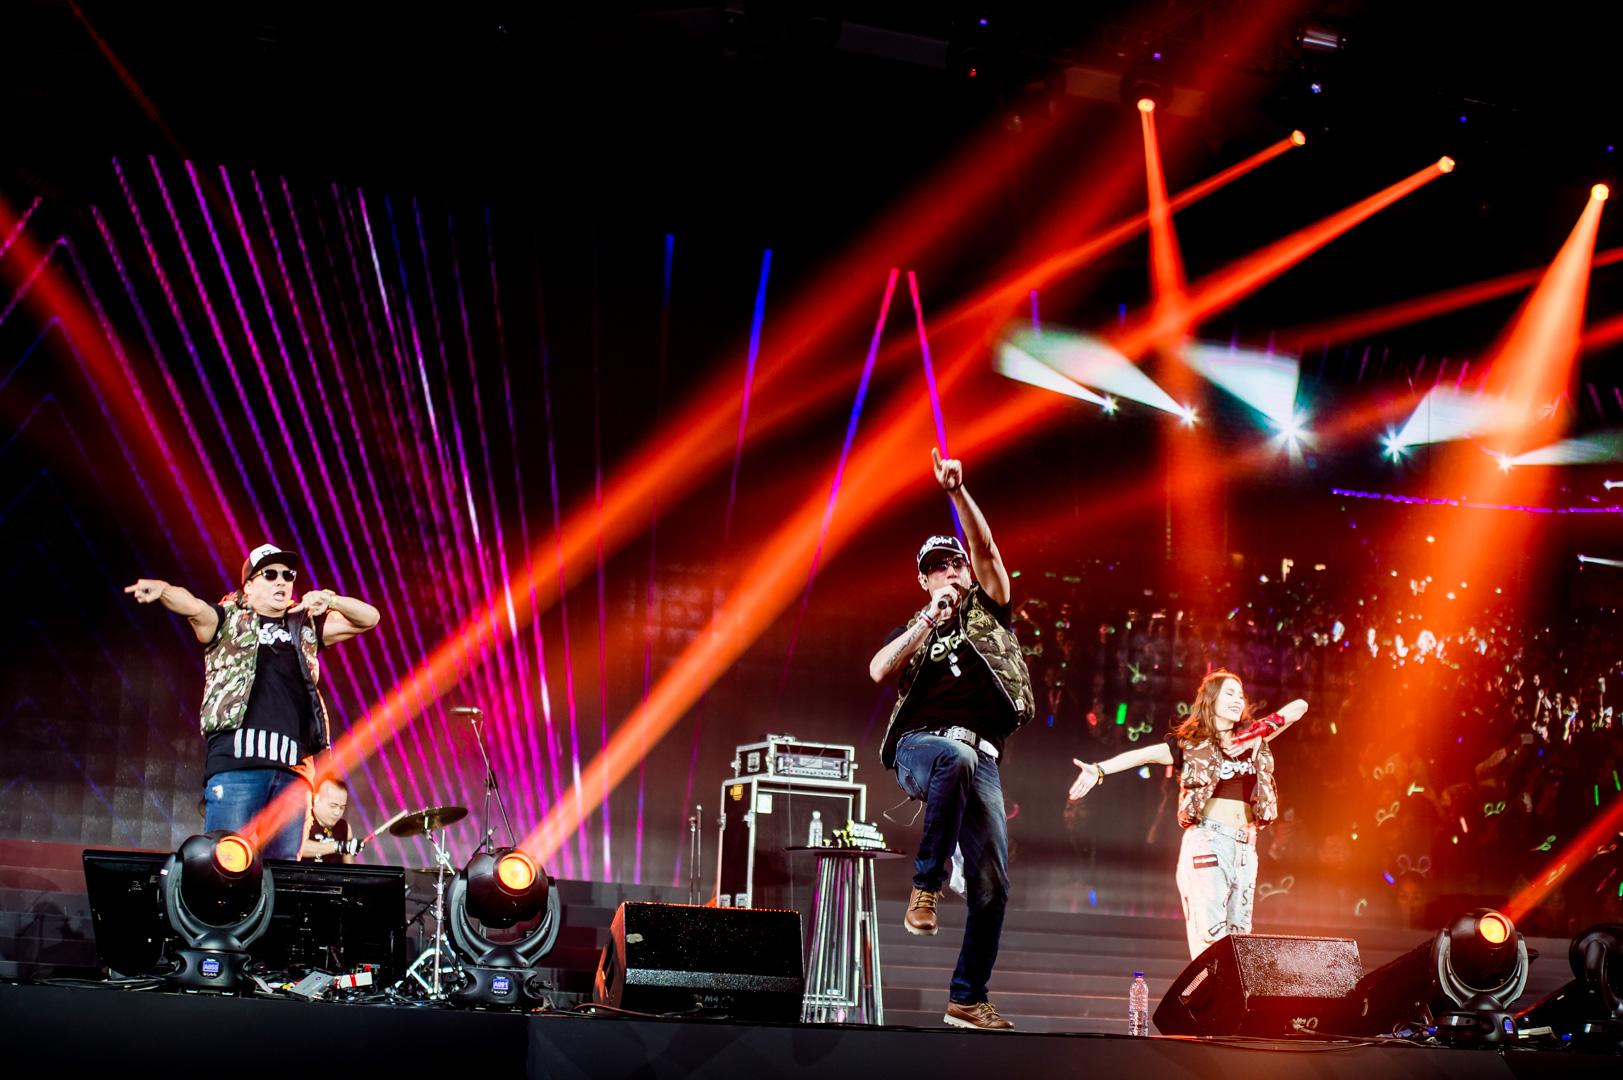 Jetrin Wattanasin In Concert